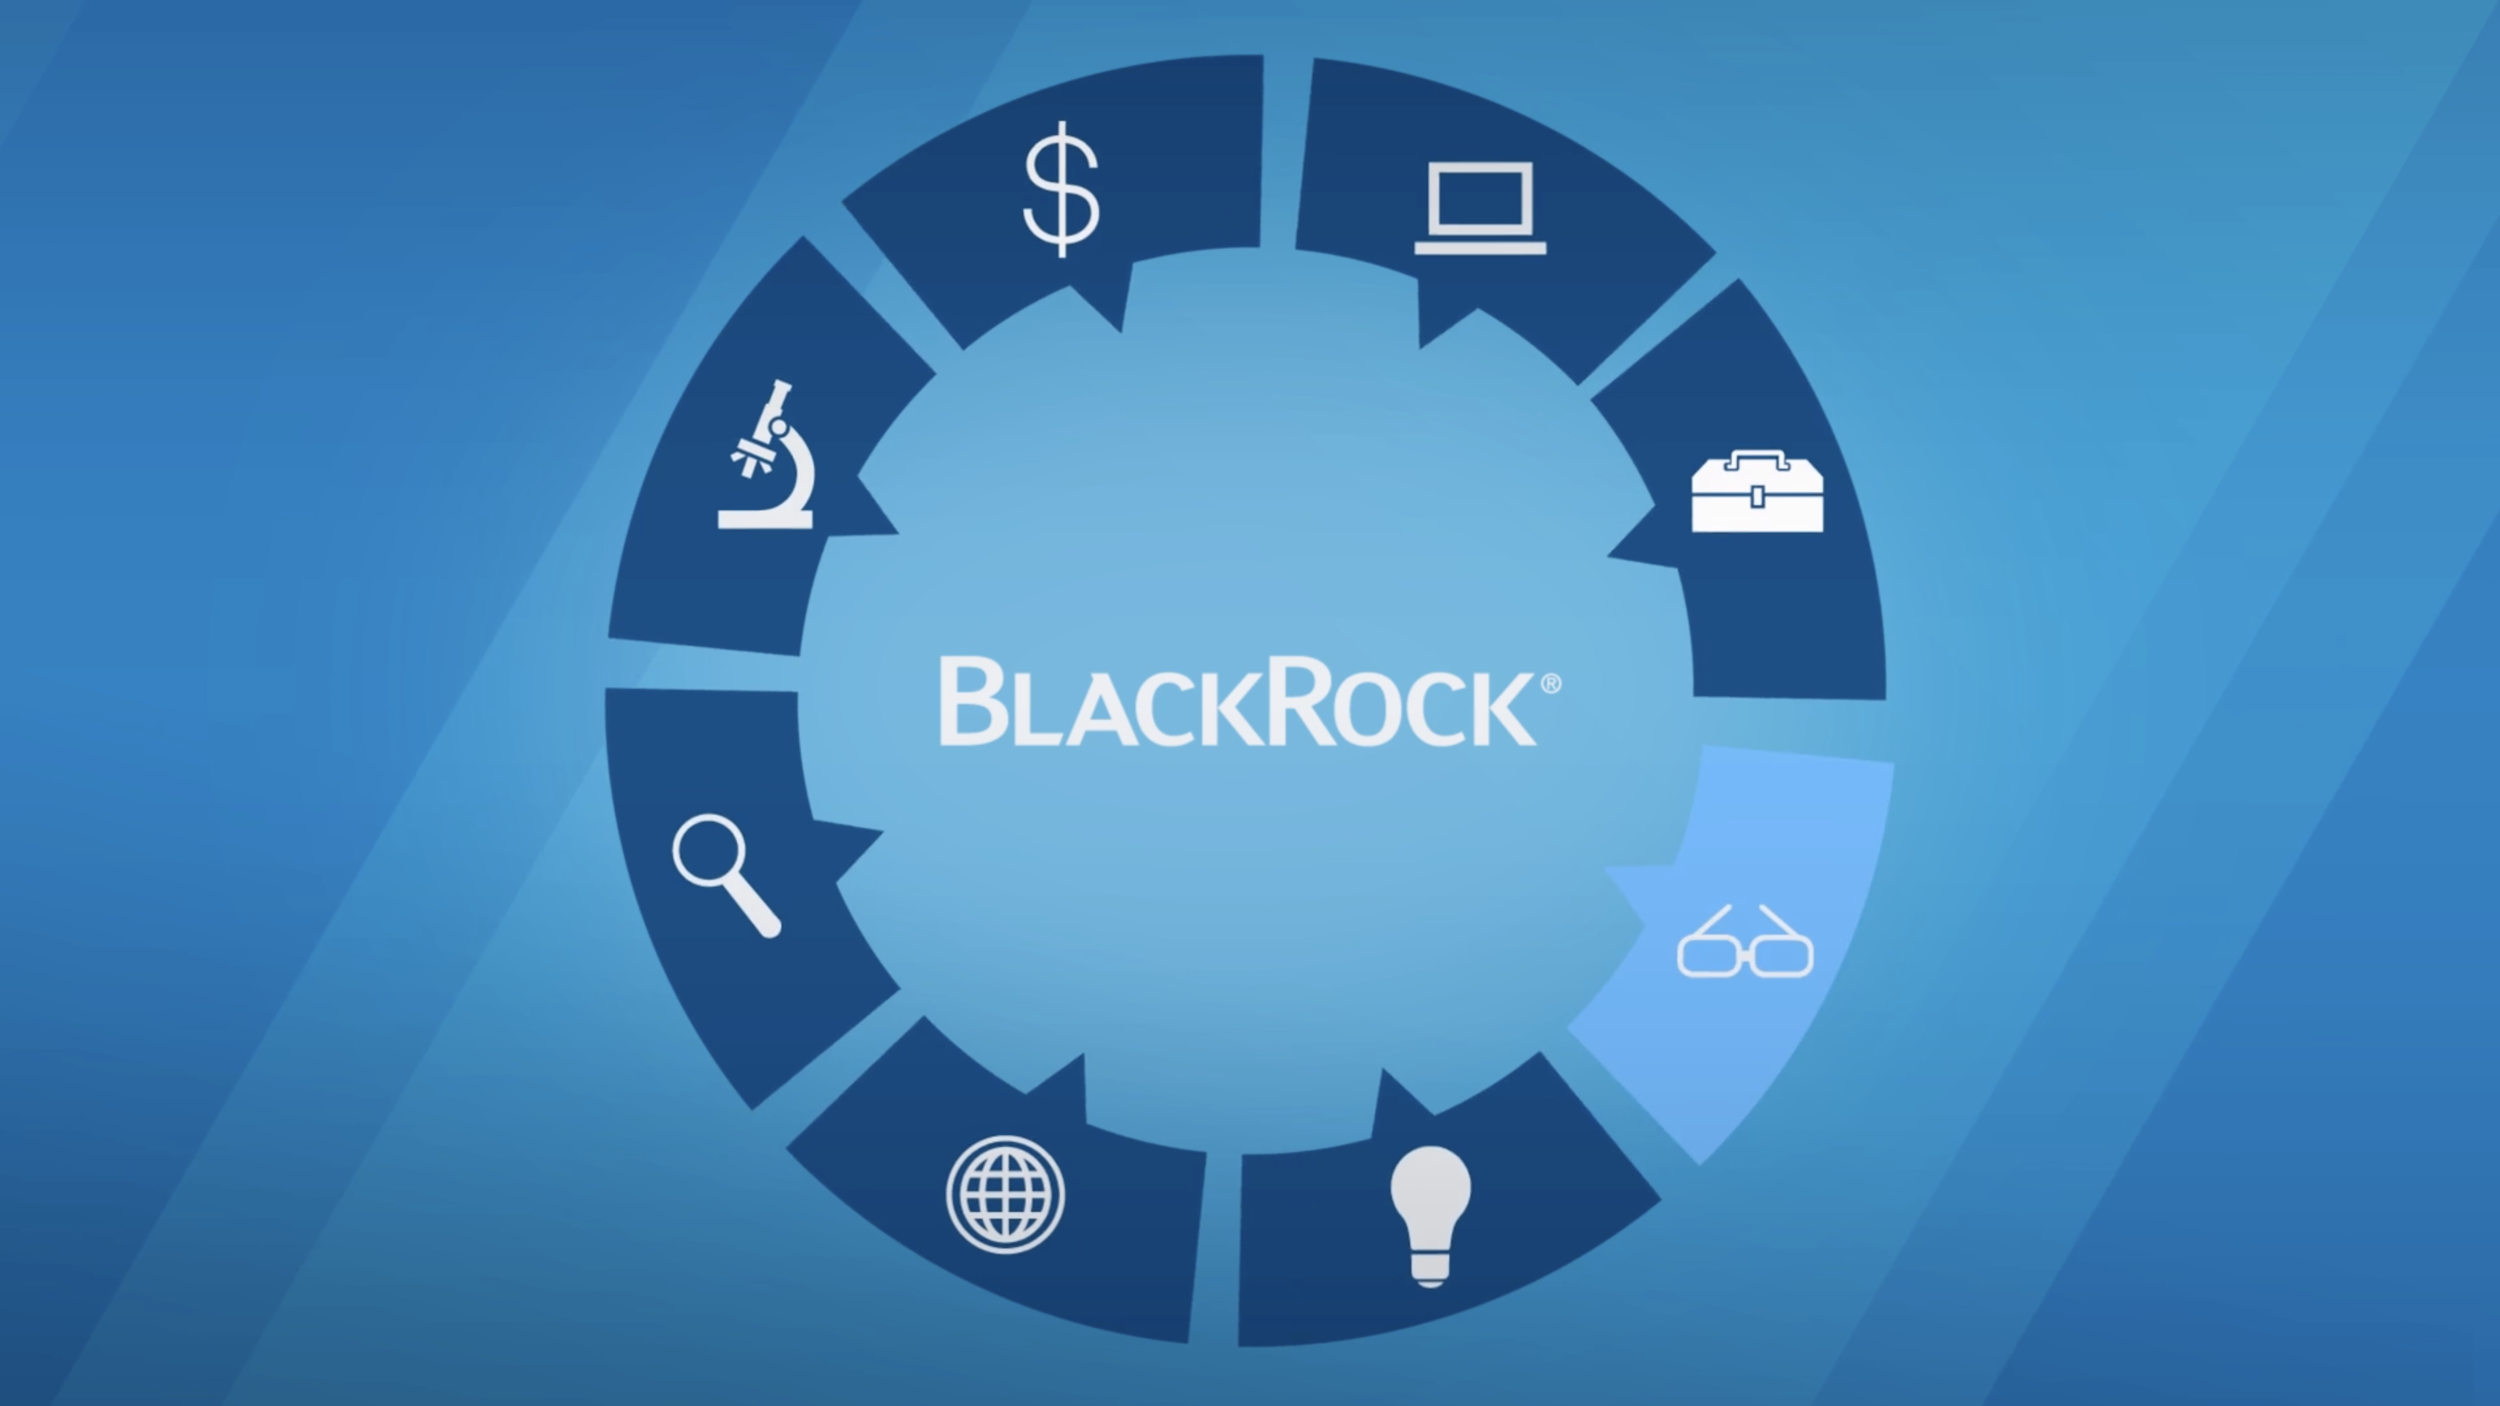 BlackRock: Pulse